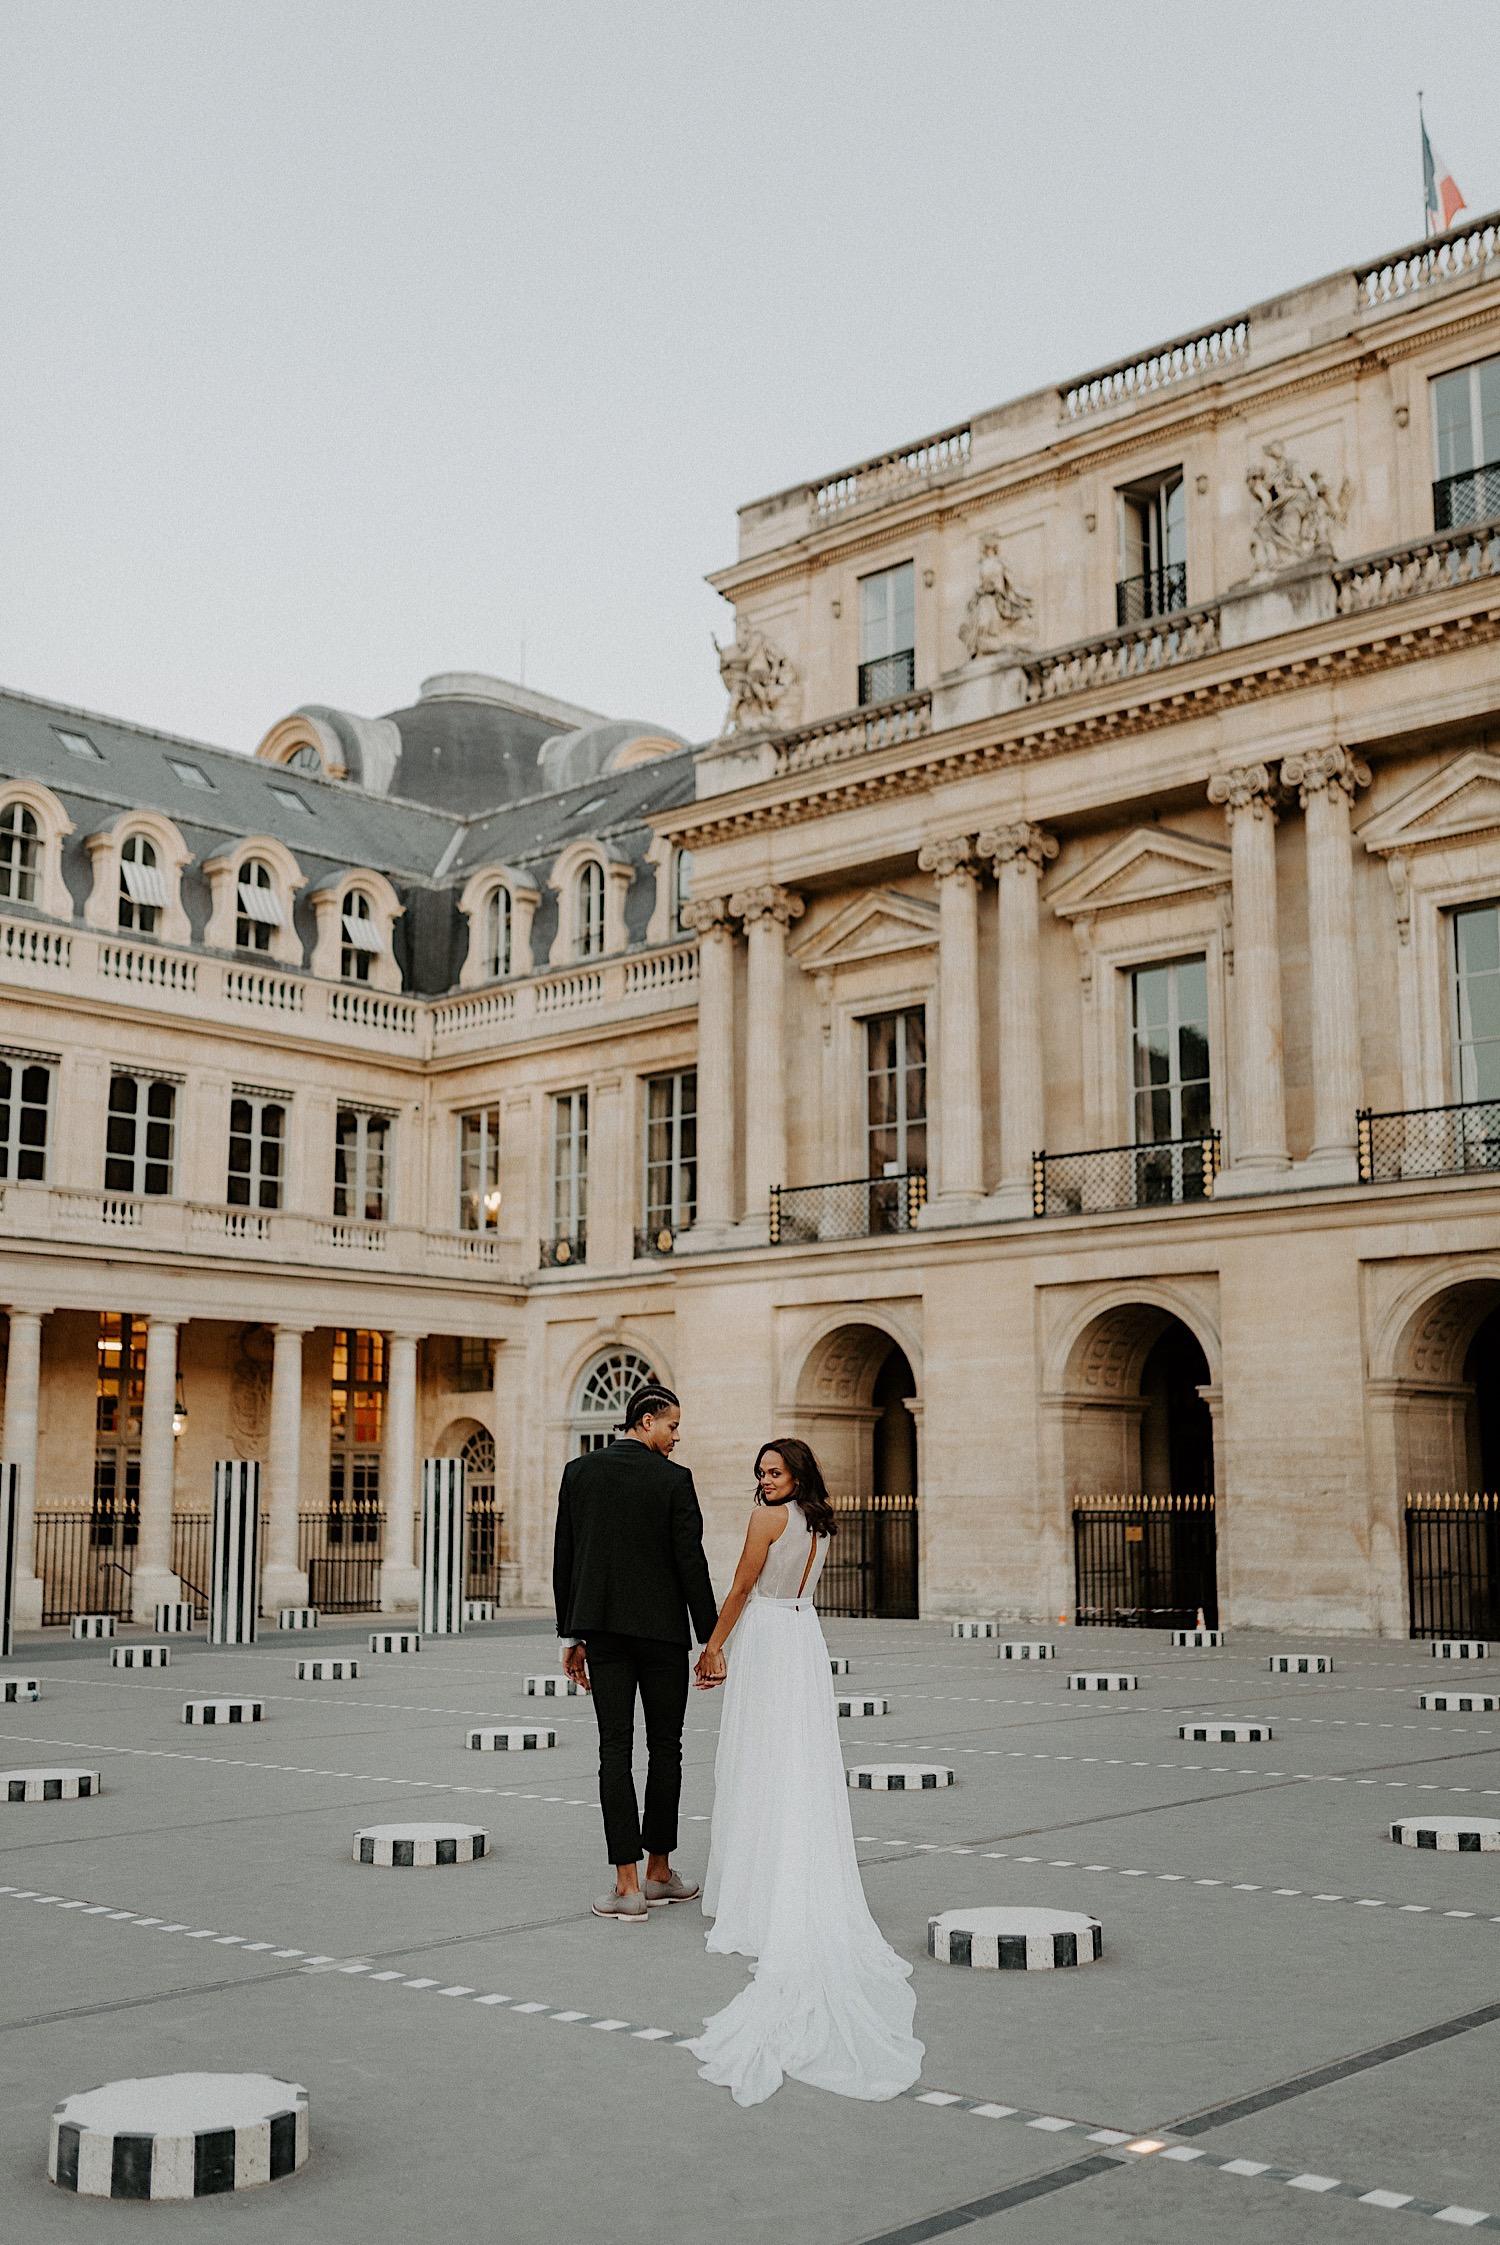 Paris Louvre Wedding Photos Paris Wedding Photographer Destination Wedding France Anais Possamai Photography 15